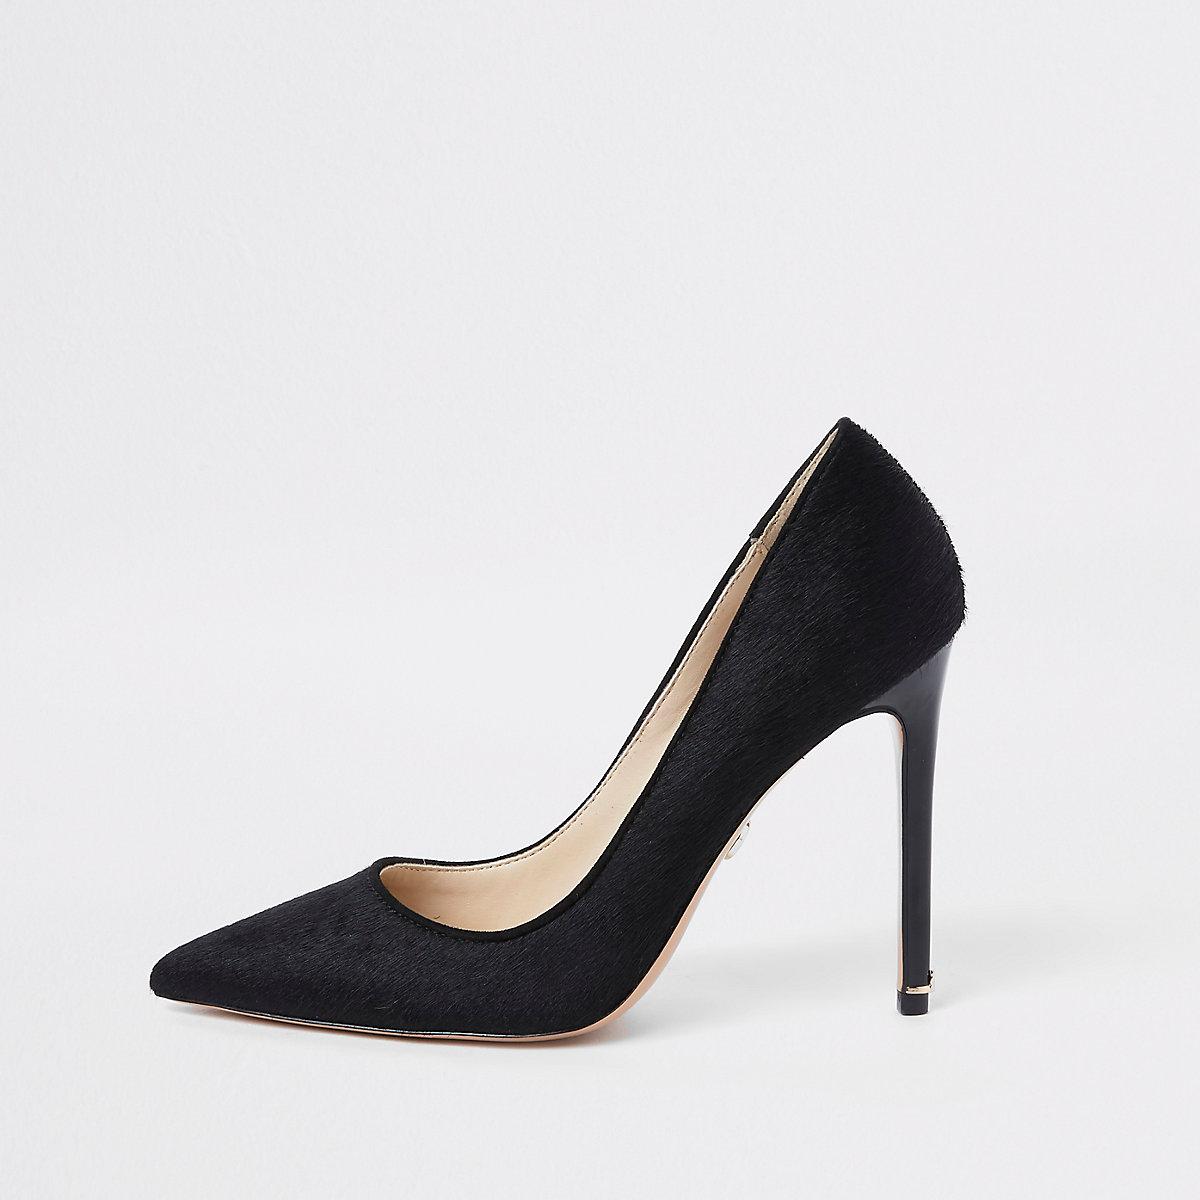 Black plush leather court shoes